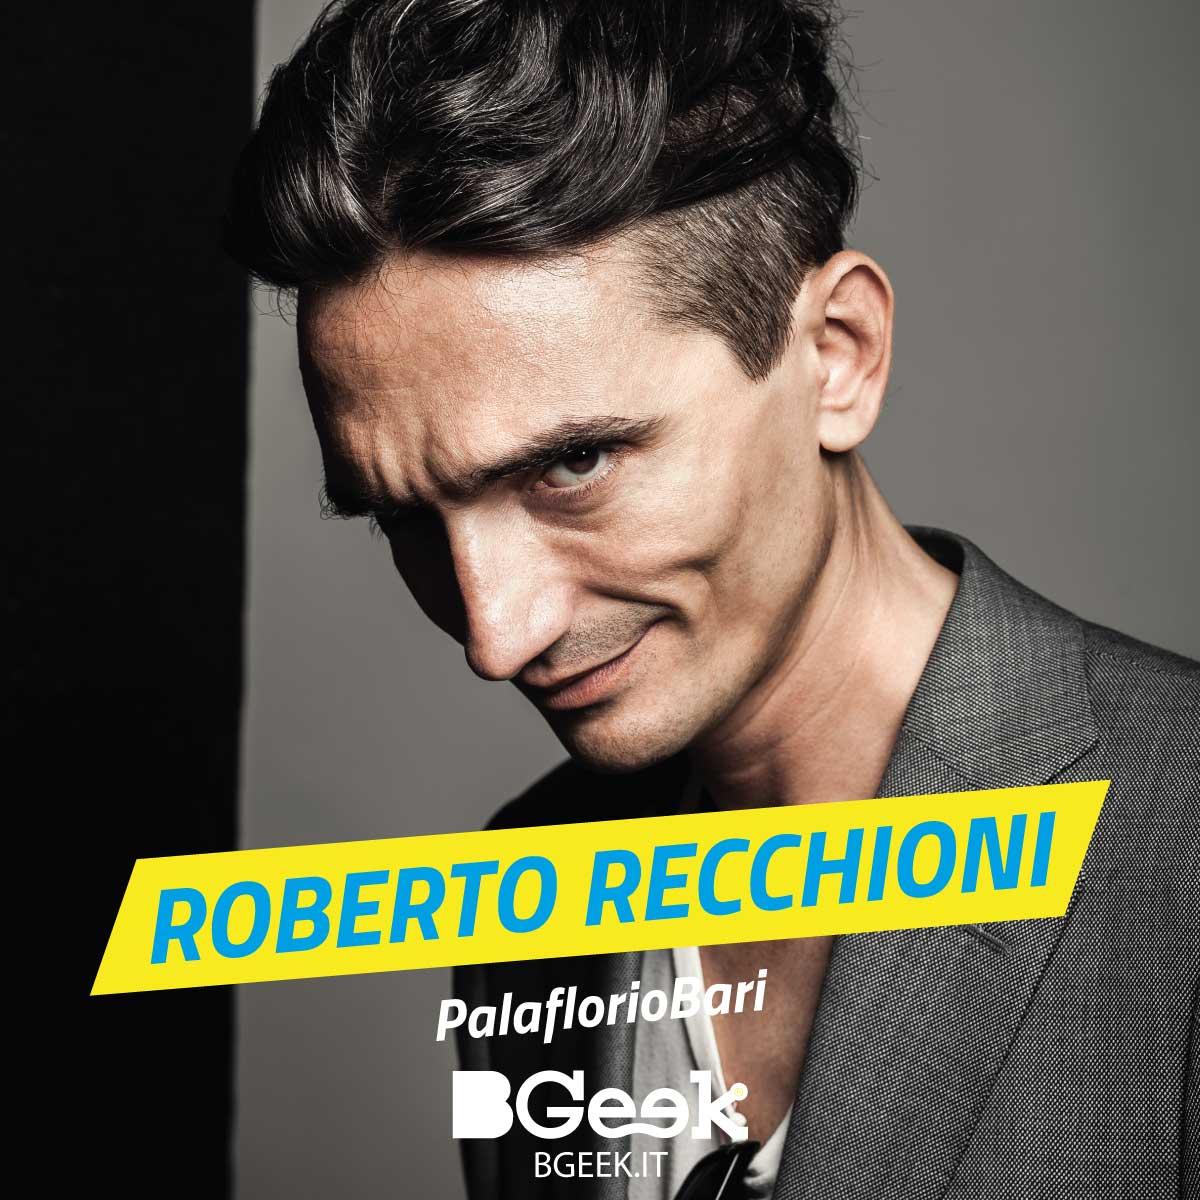 Bgeek_website_ospiti_1200x1200_roberto_recchioni